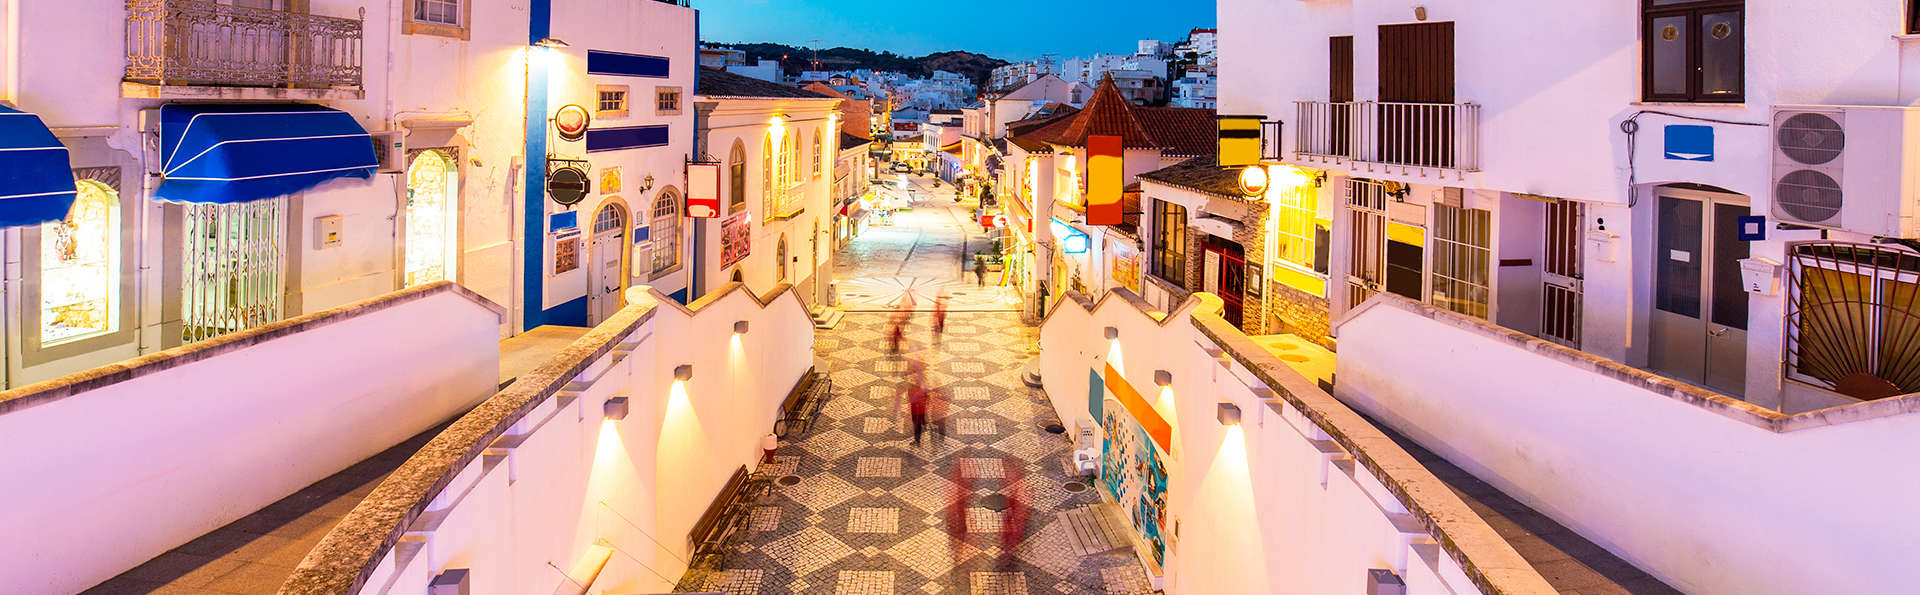 Aqua Pedra Dos Bicos Beach Hotel (Adults Only) - EDIT_destination1.jpg